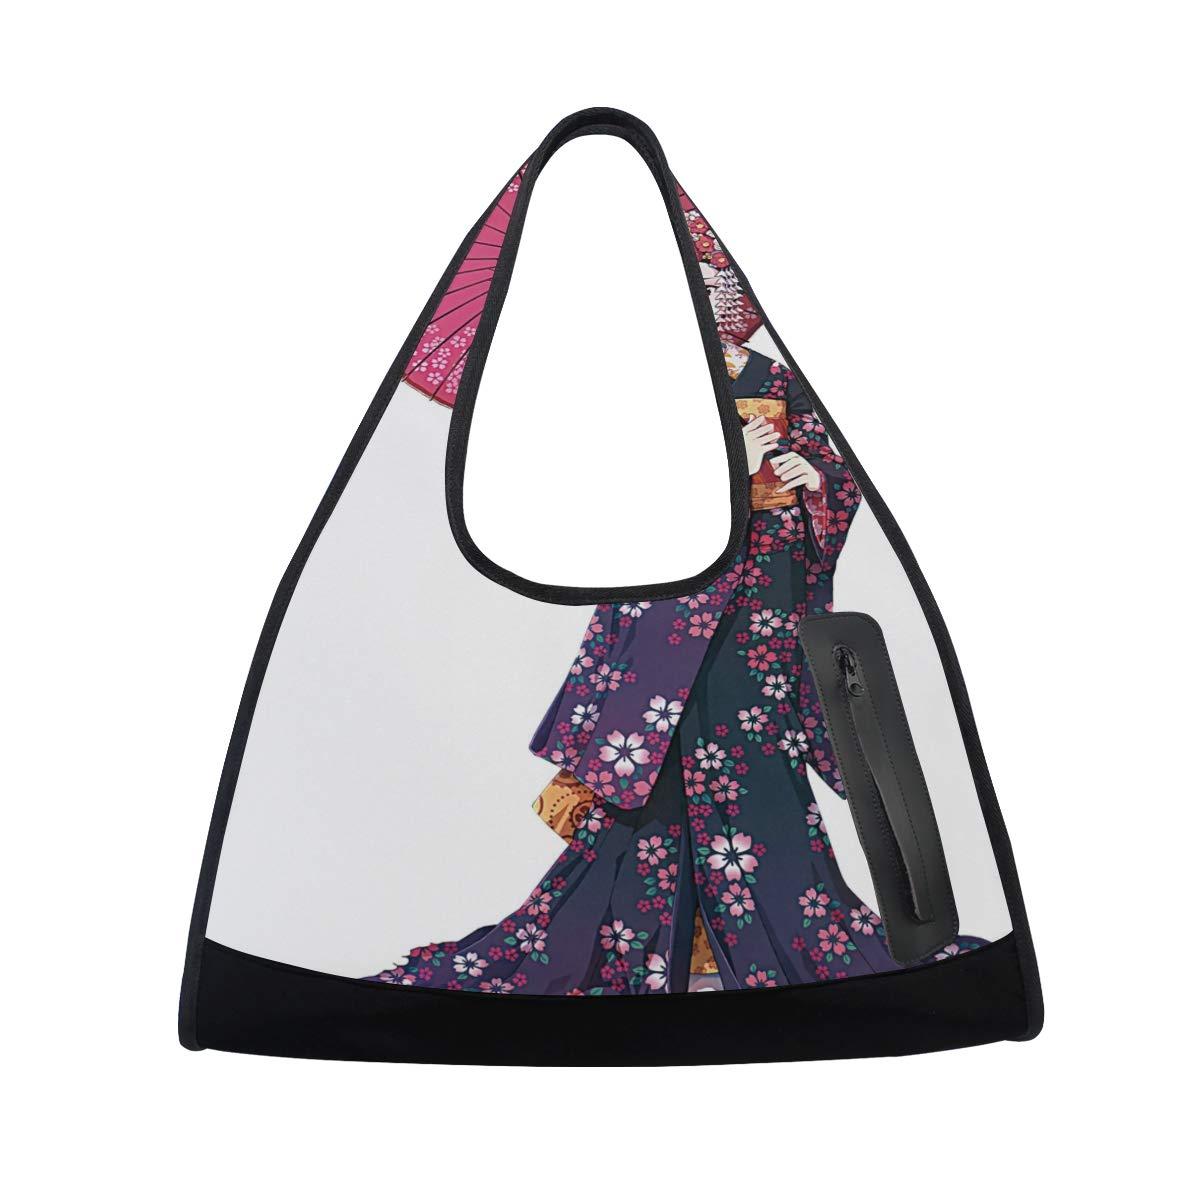 Japanese Kimono Girl Women Sports Gym Totes Bag Multi-Function Nylon Travel Shoulder Bag